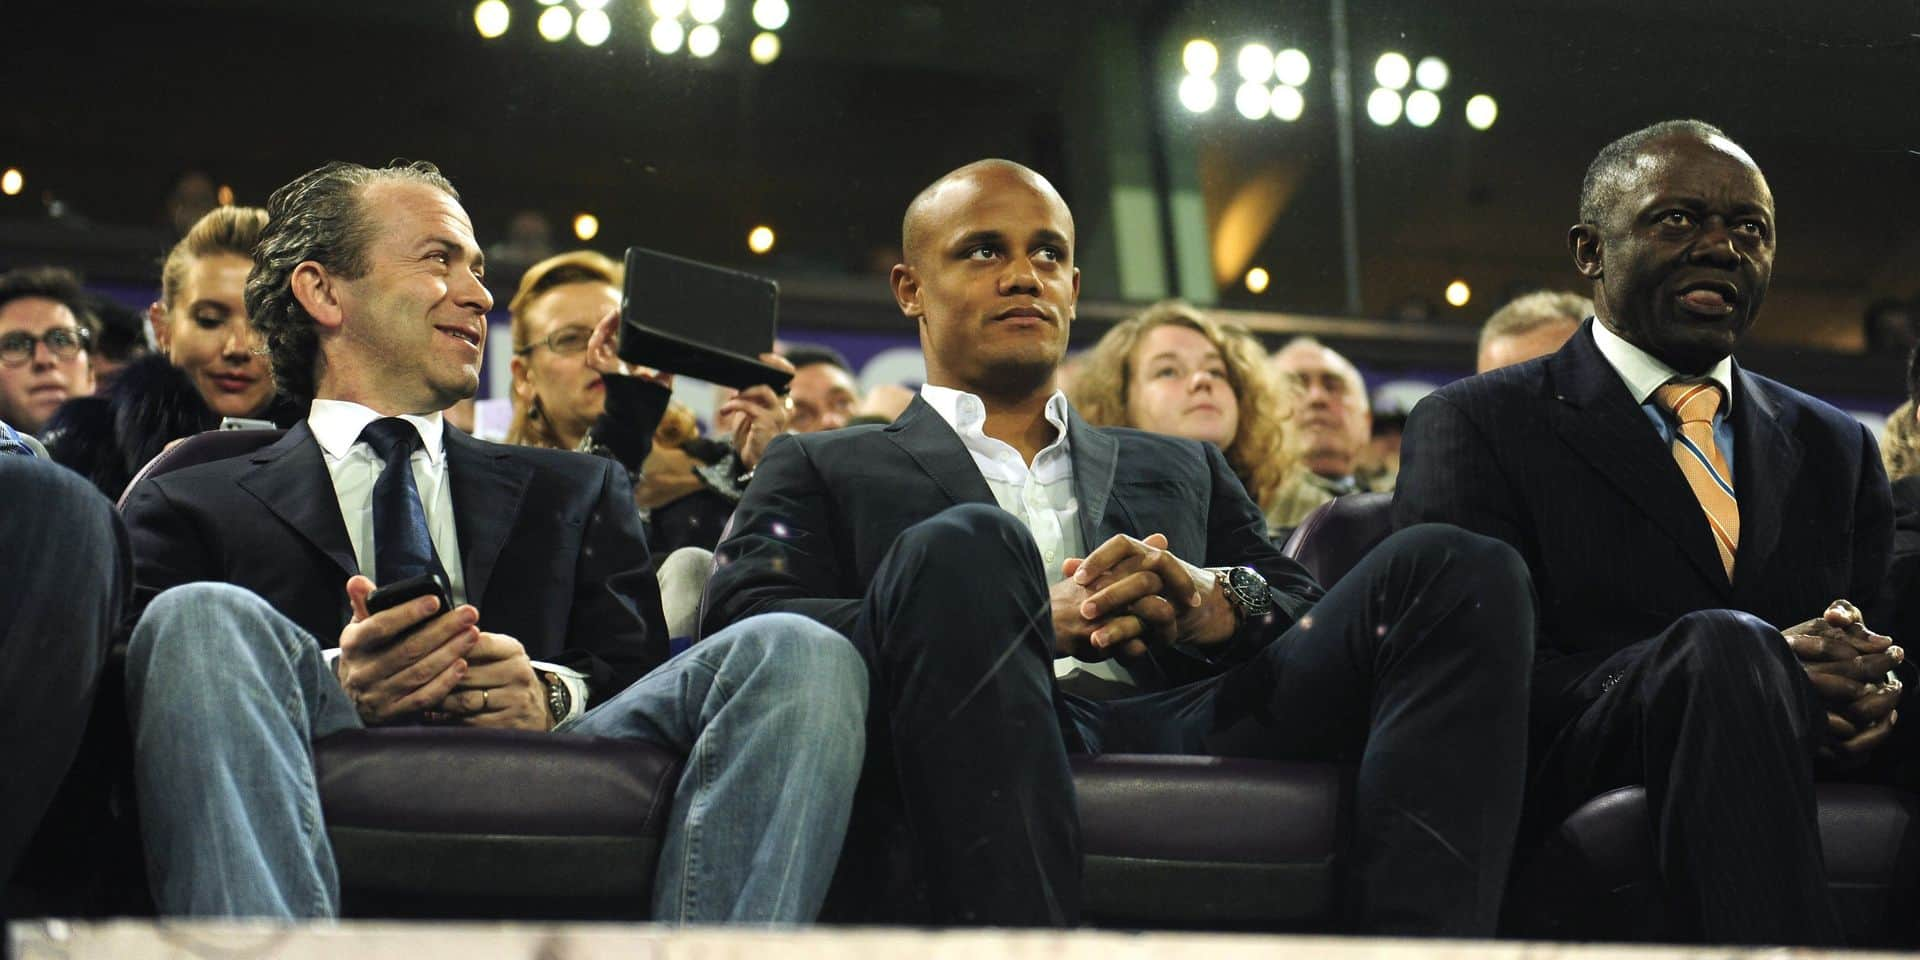 """Avec Kompany, on ne se moquera plus d'Anderlecht"""